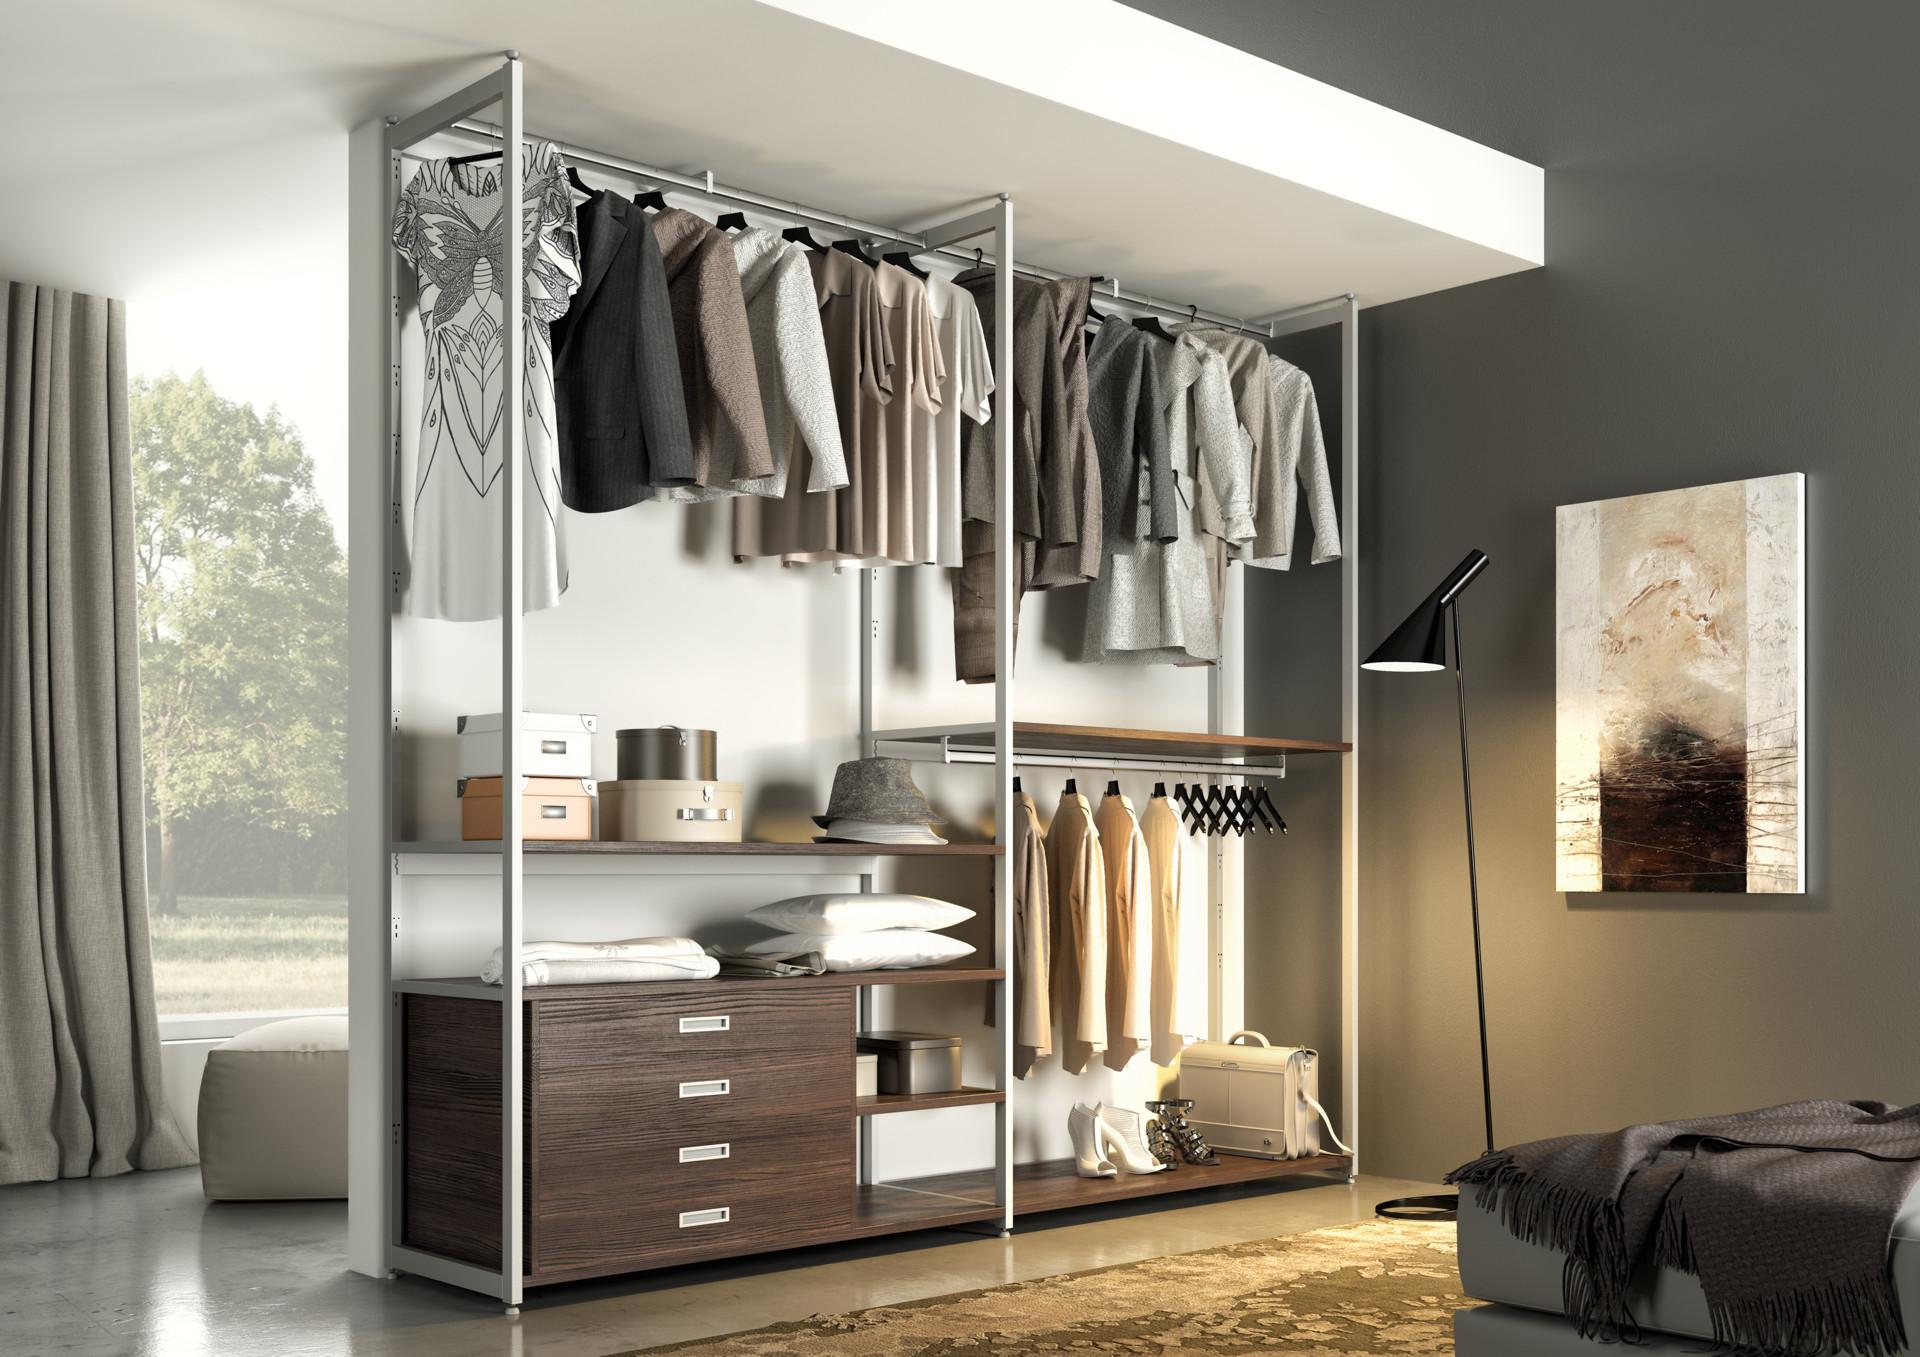 Laldesign cabine armadio - Porte scorrevoli cabine armadio ...